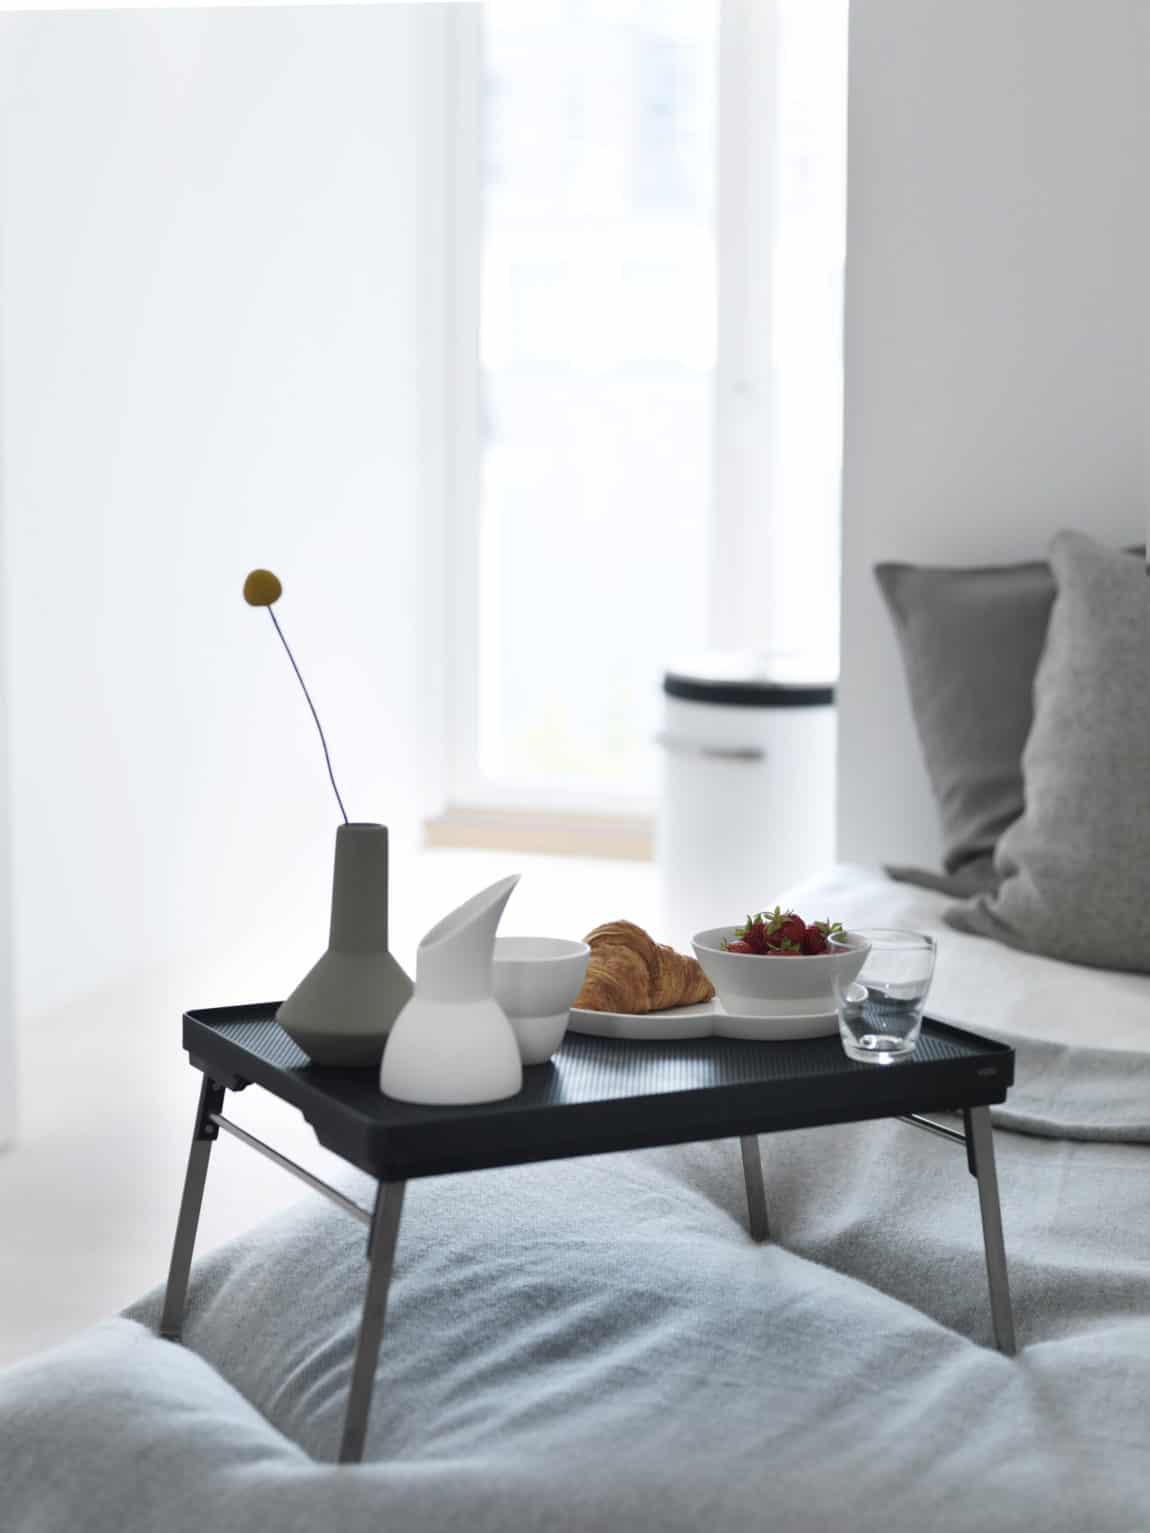 The Home of Morten Bo Jensen by Vipp (16)